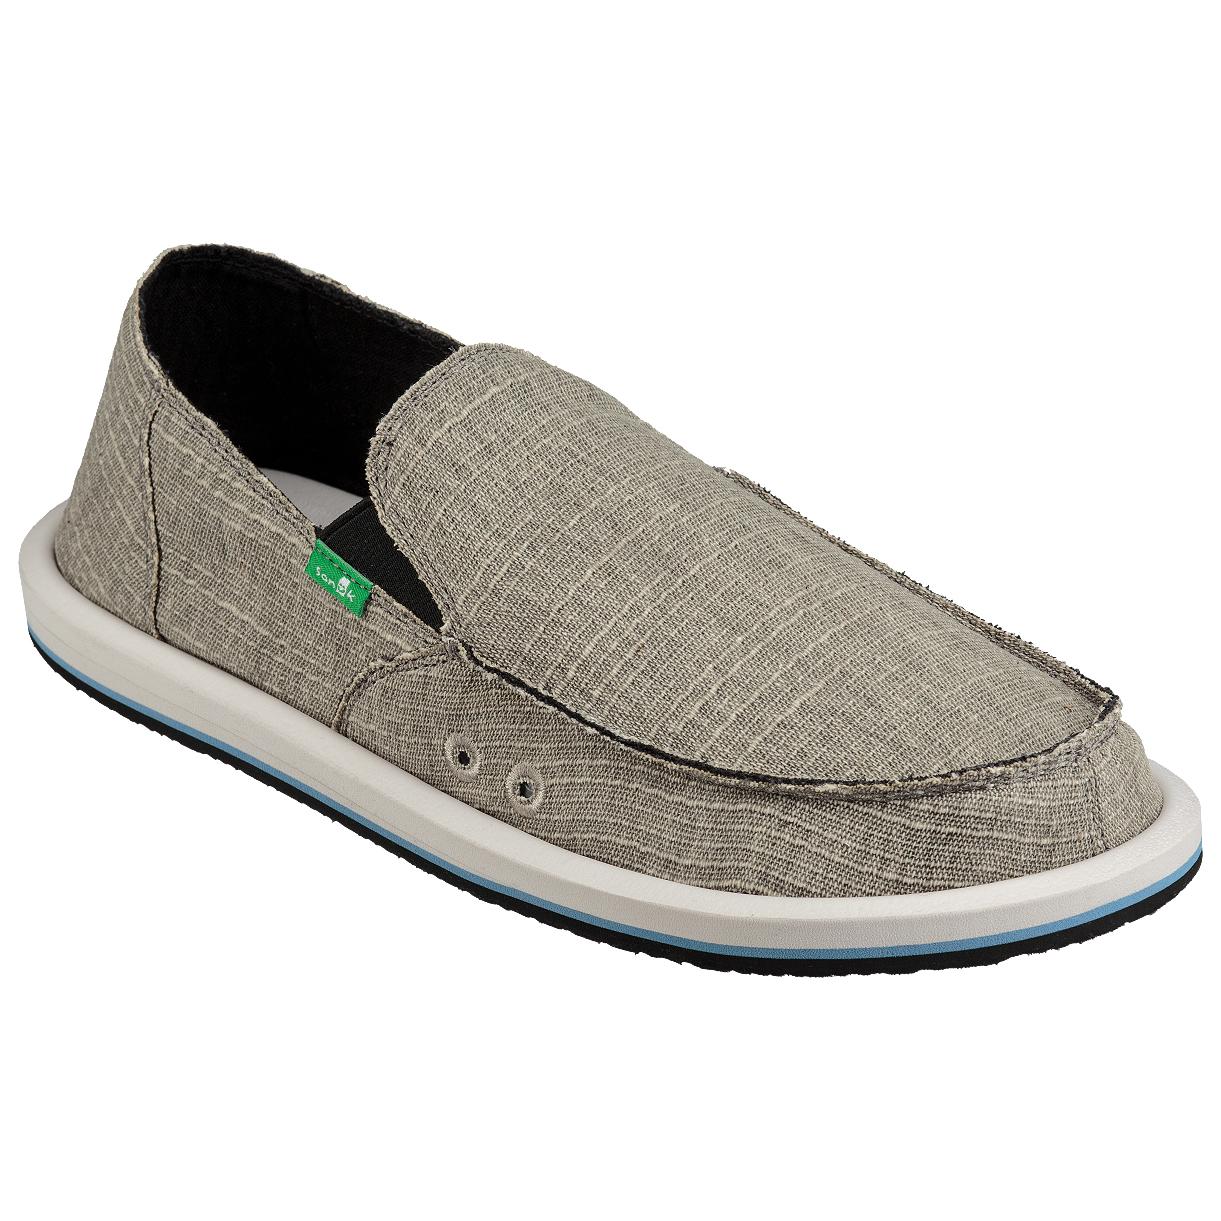 Sanuk Vagabond Grain Slub Sneaker Herren online kaufen